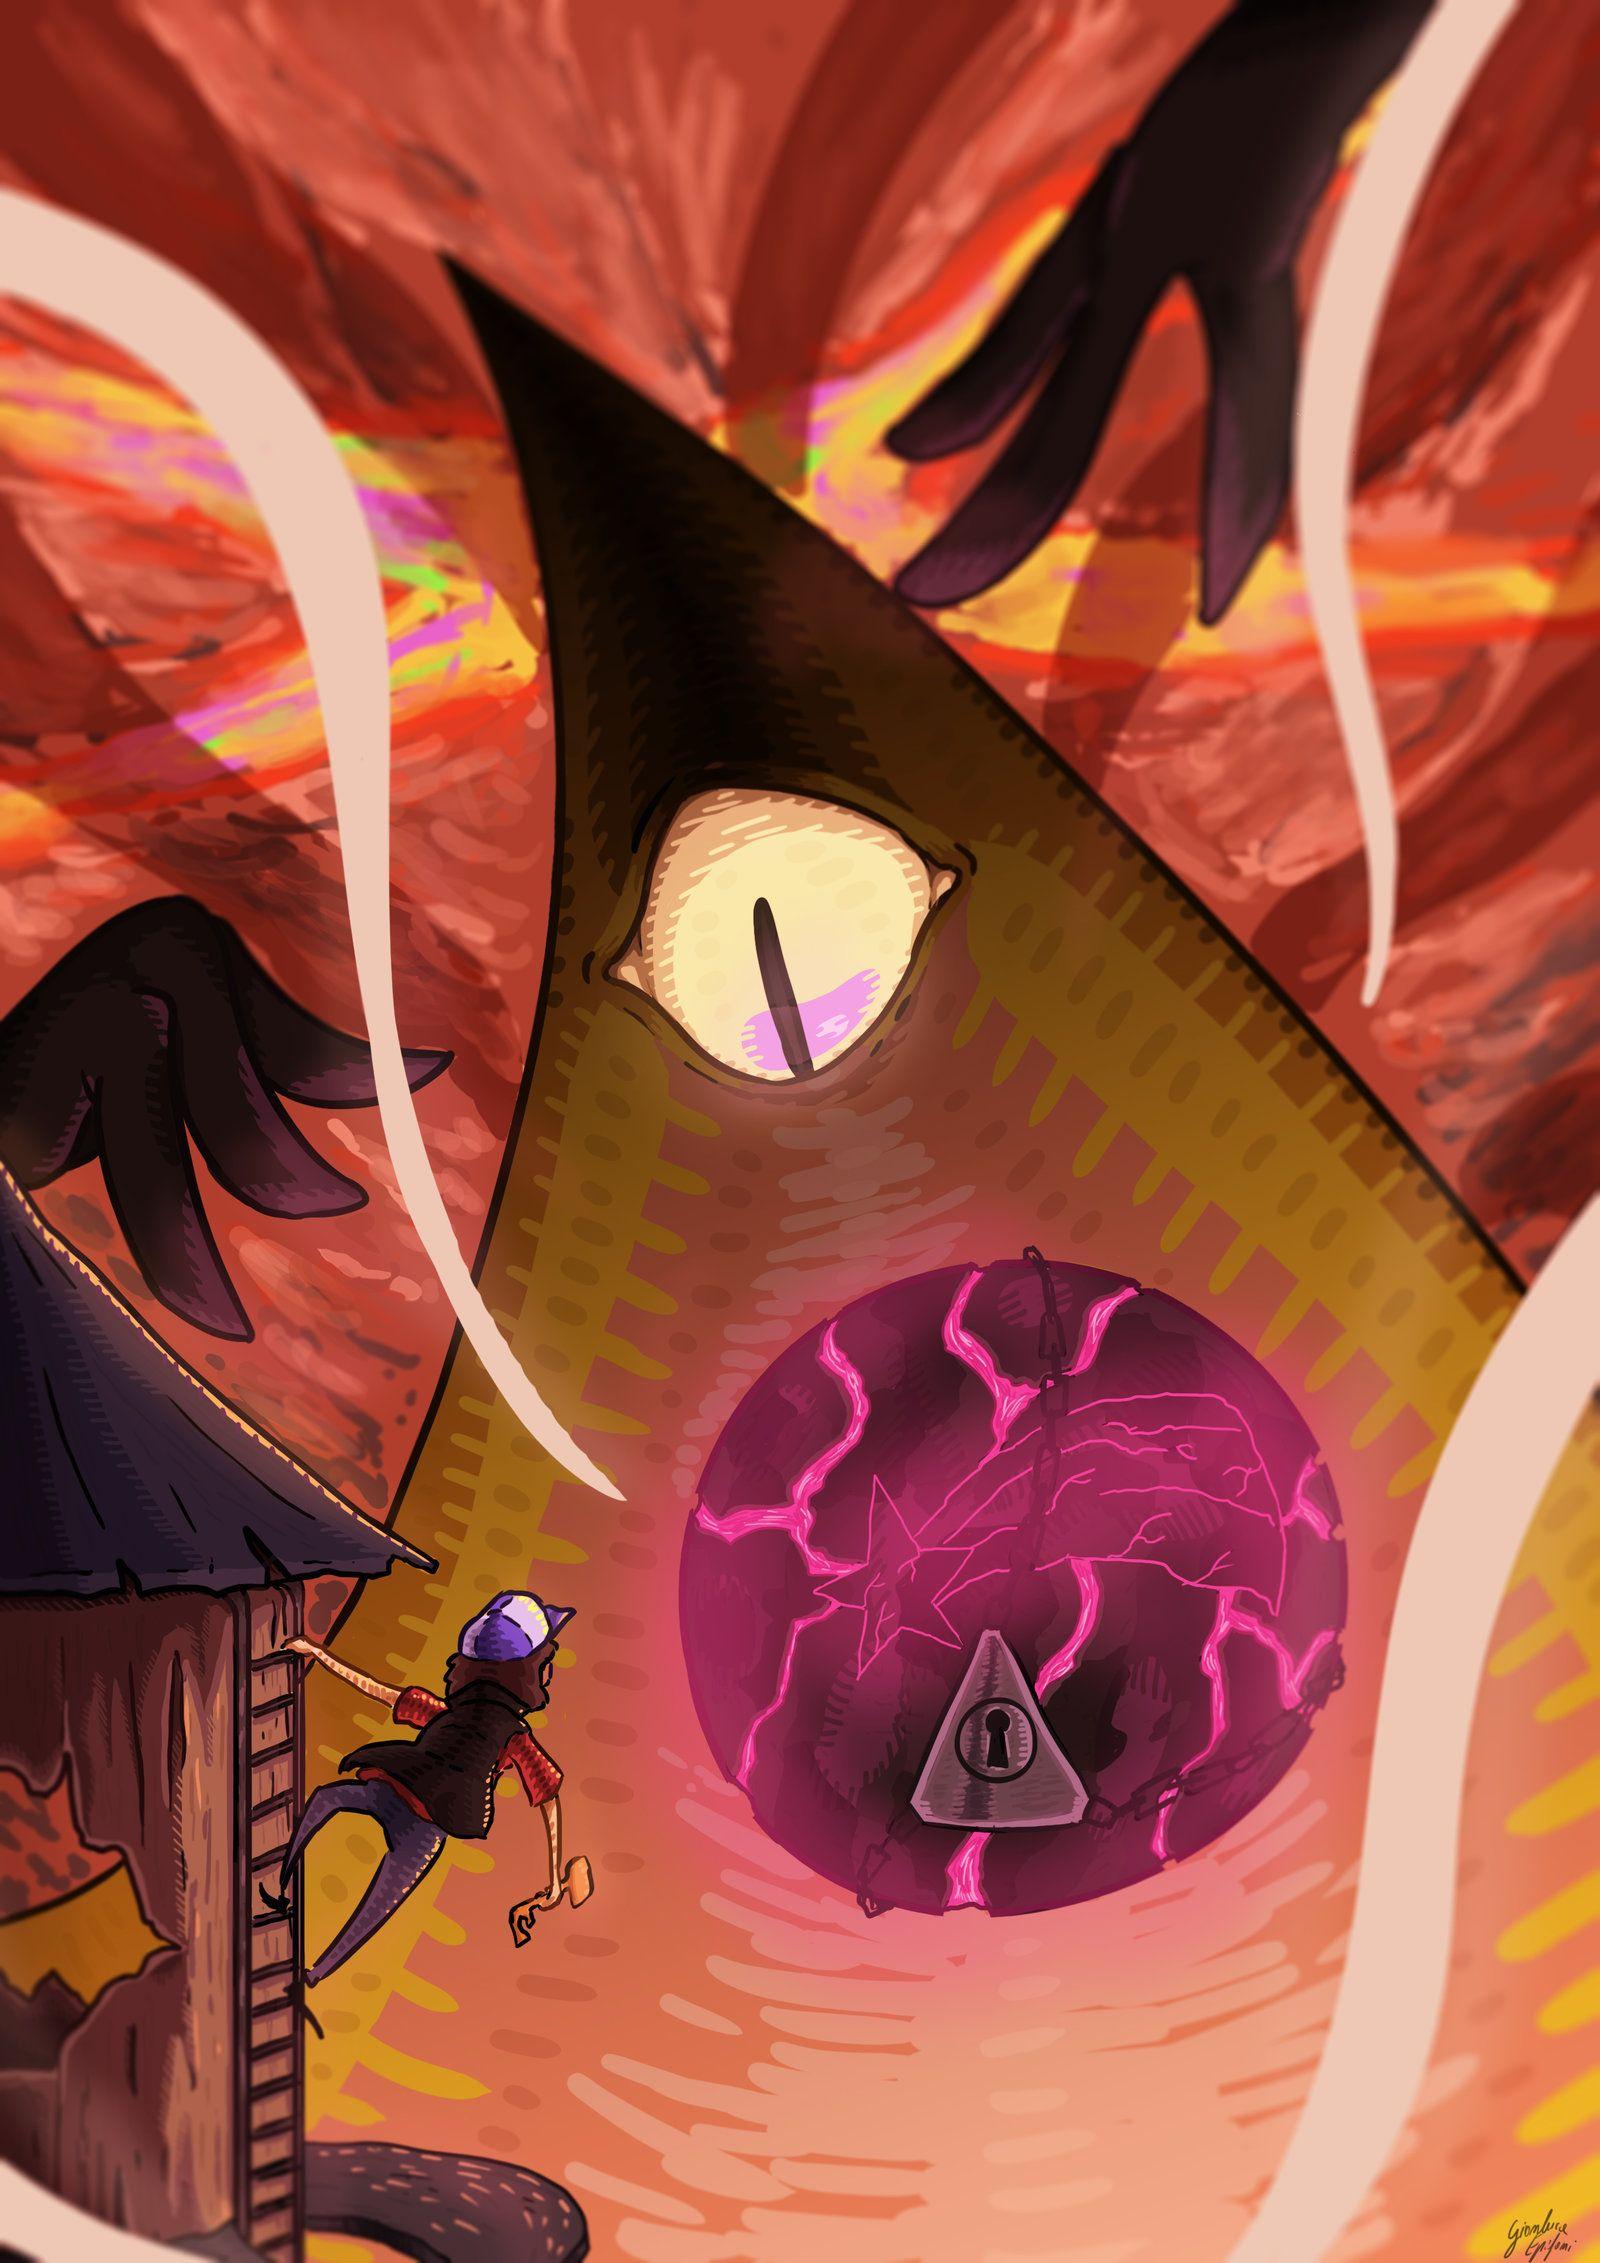 Reverse Falls Will Cipher Wallpaper Gravity Falls Weirdmageddon By C U Po Gravity Falls